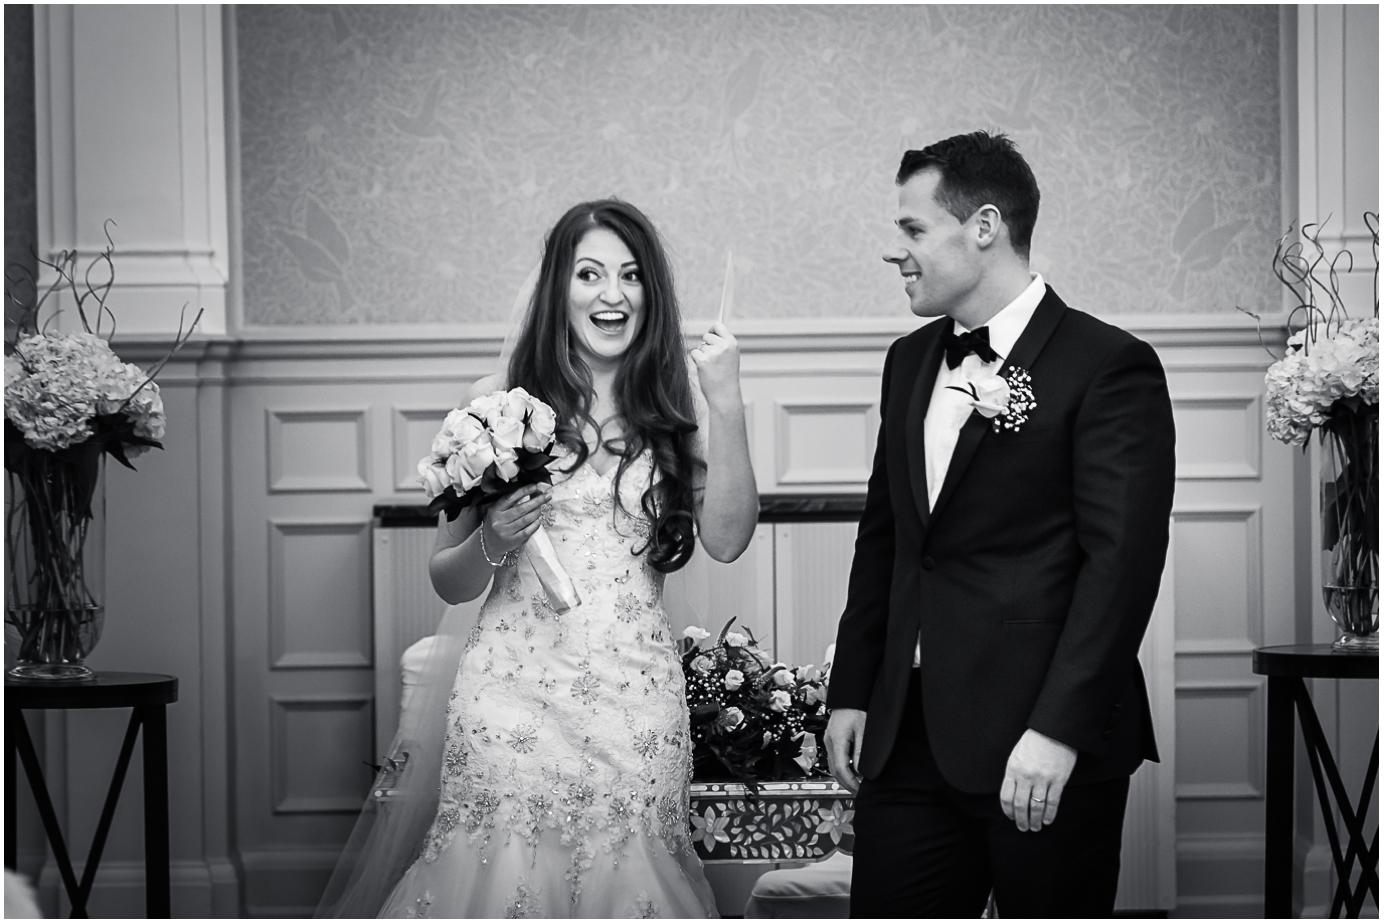 40 - Esmat and Angus - St. Ermin's Hotel London wedding photographer